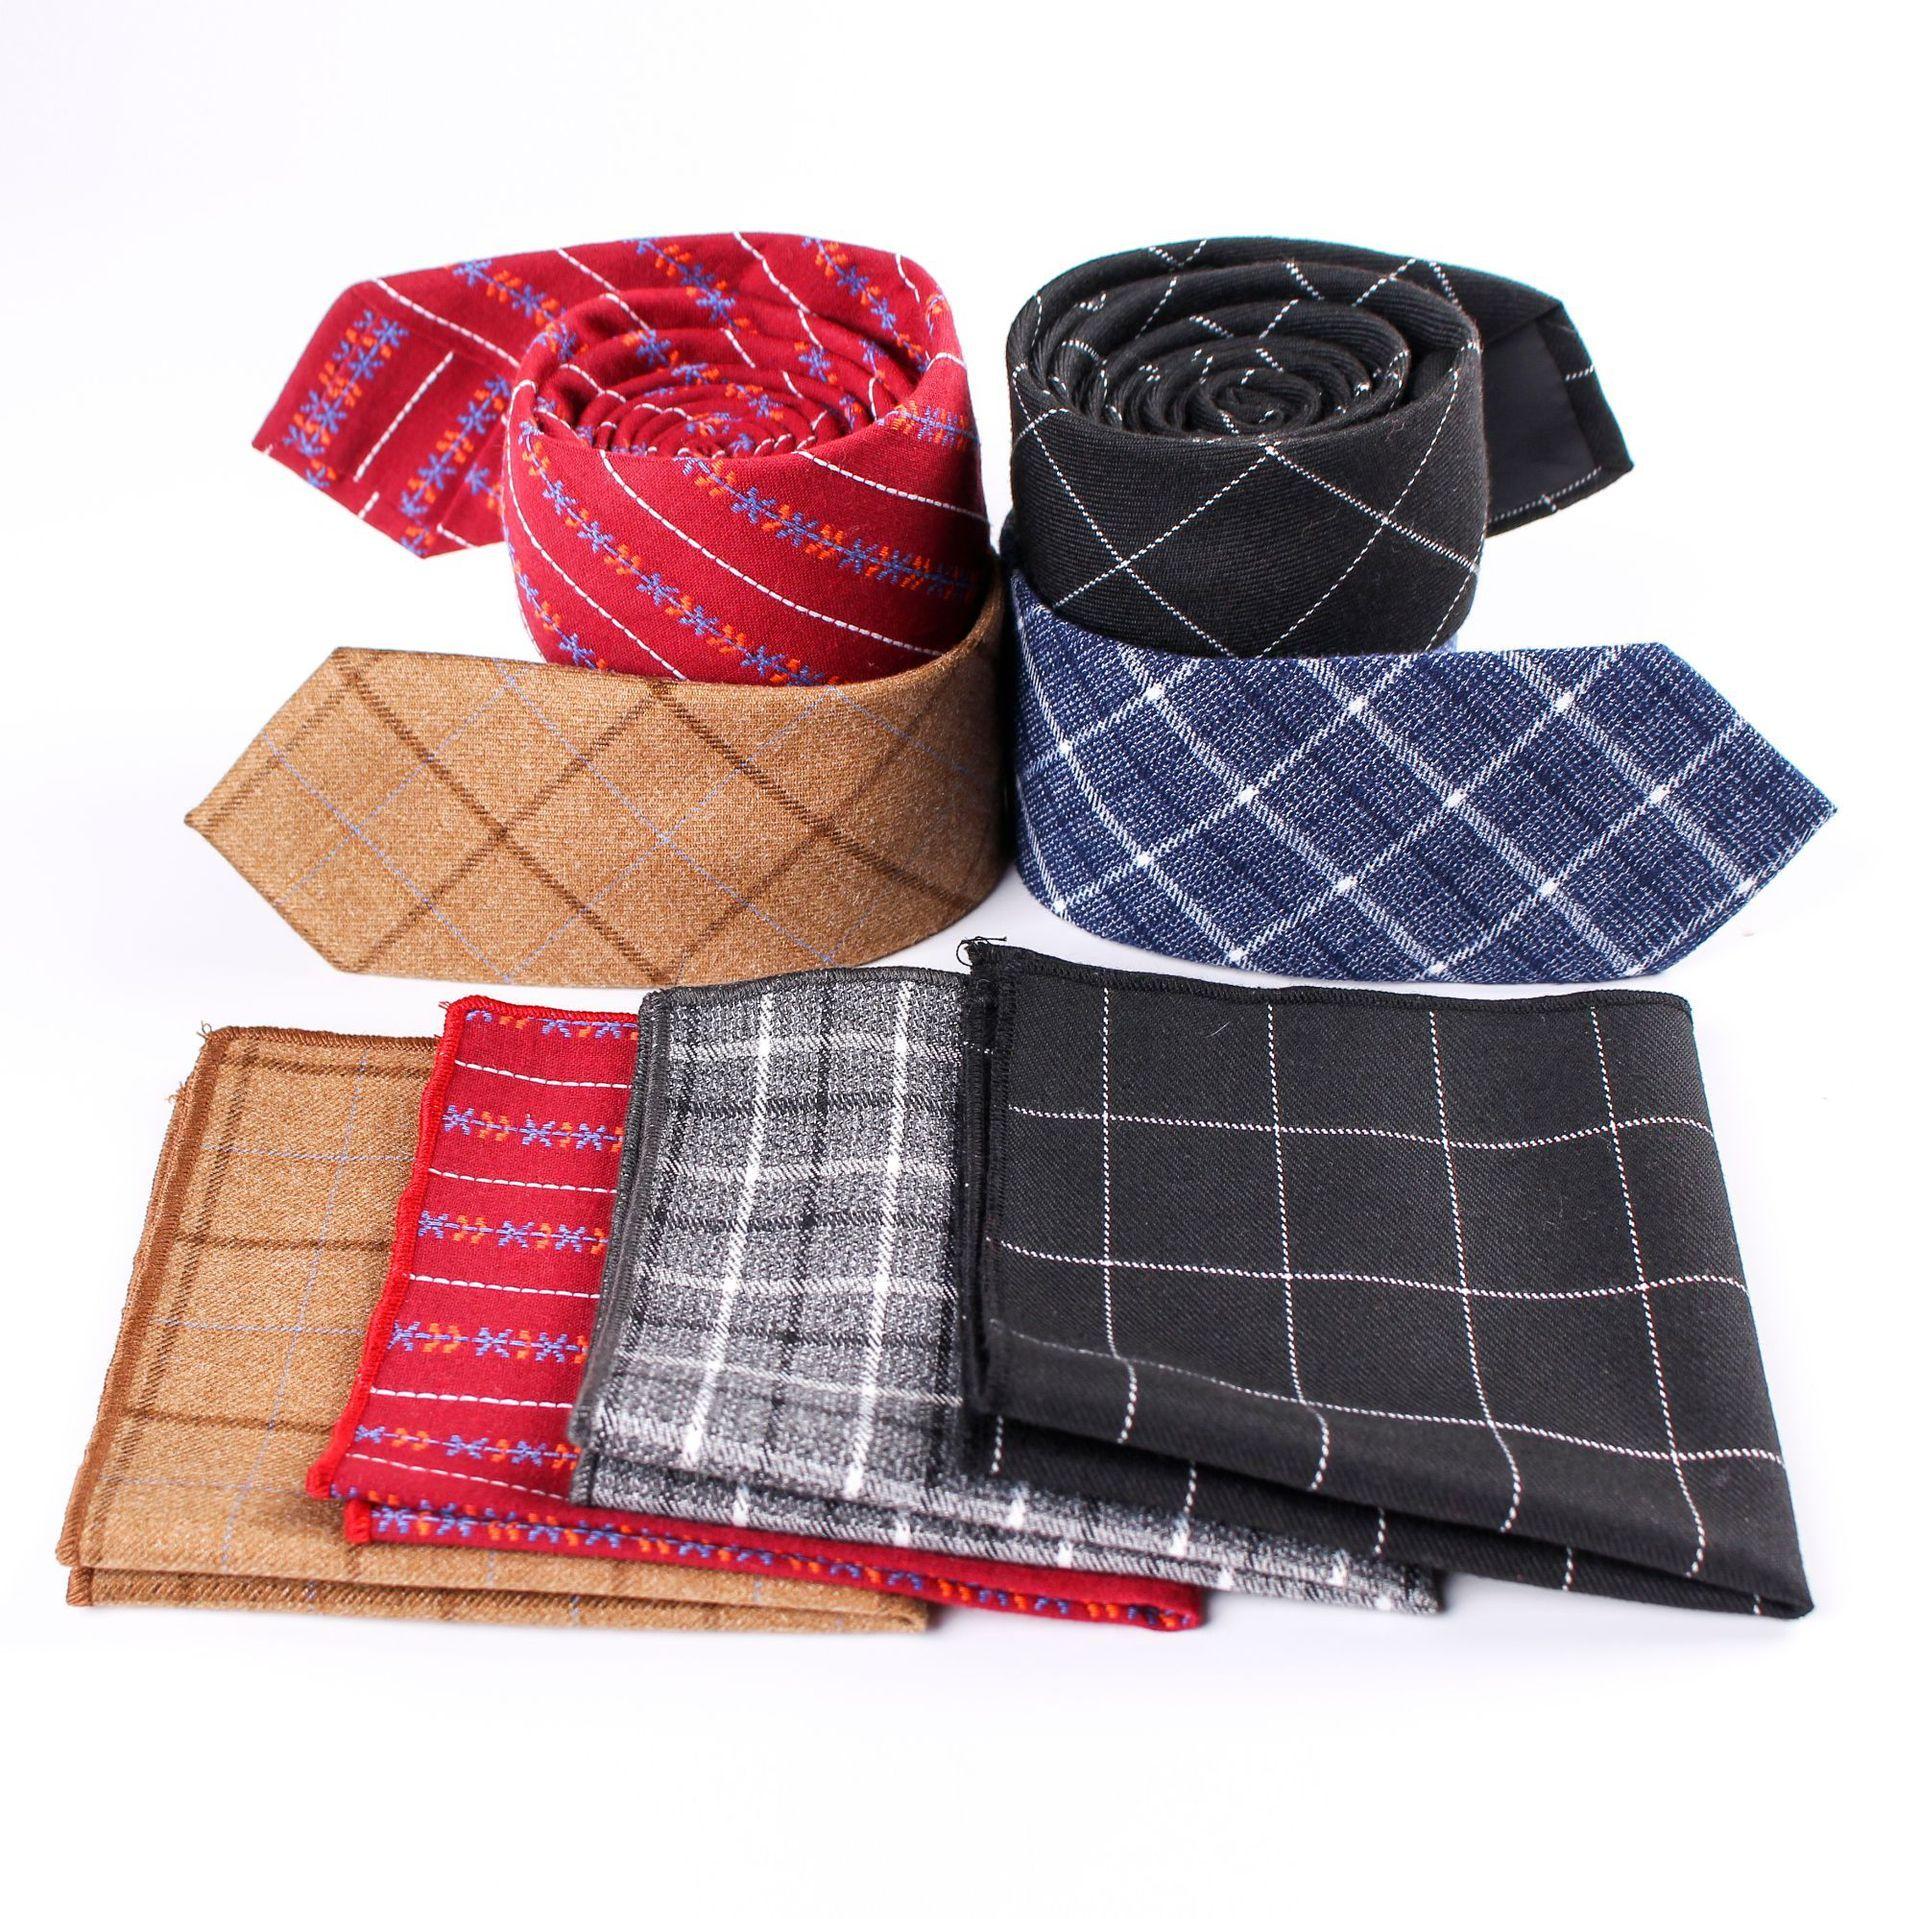 6ec7de87b9ea Business and leisure tie Men's cotton checked pocket towel wedding party  Fashion Tie Suit